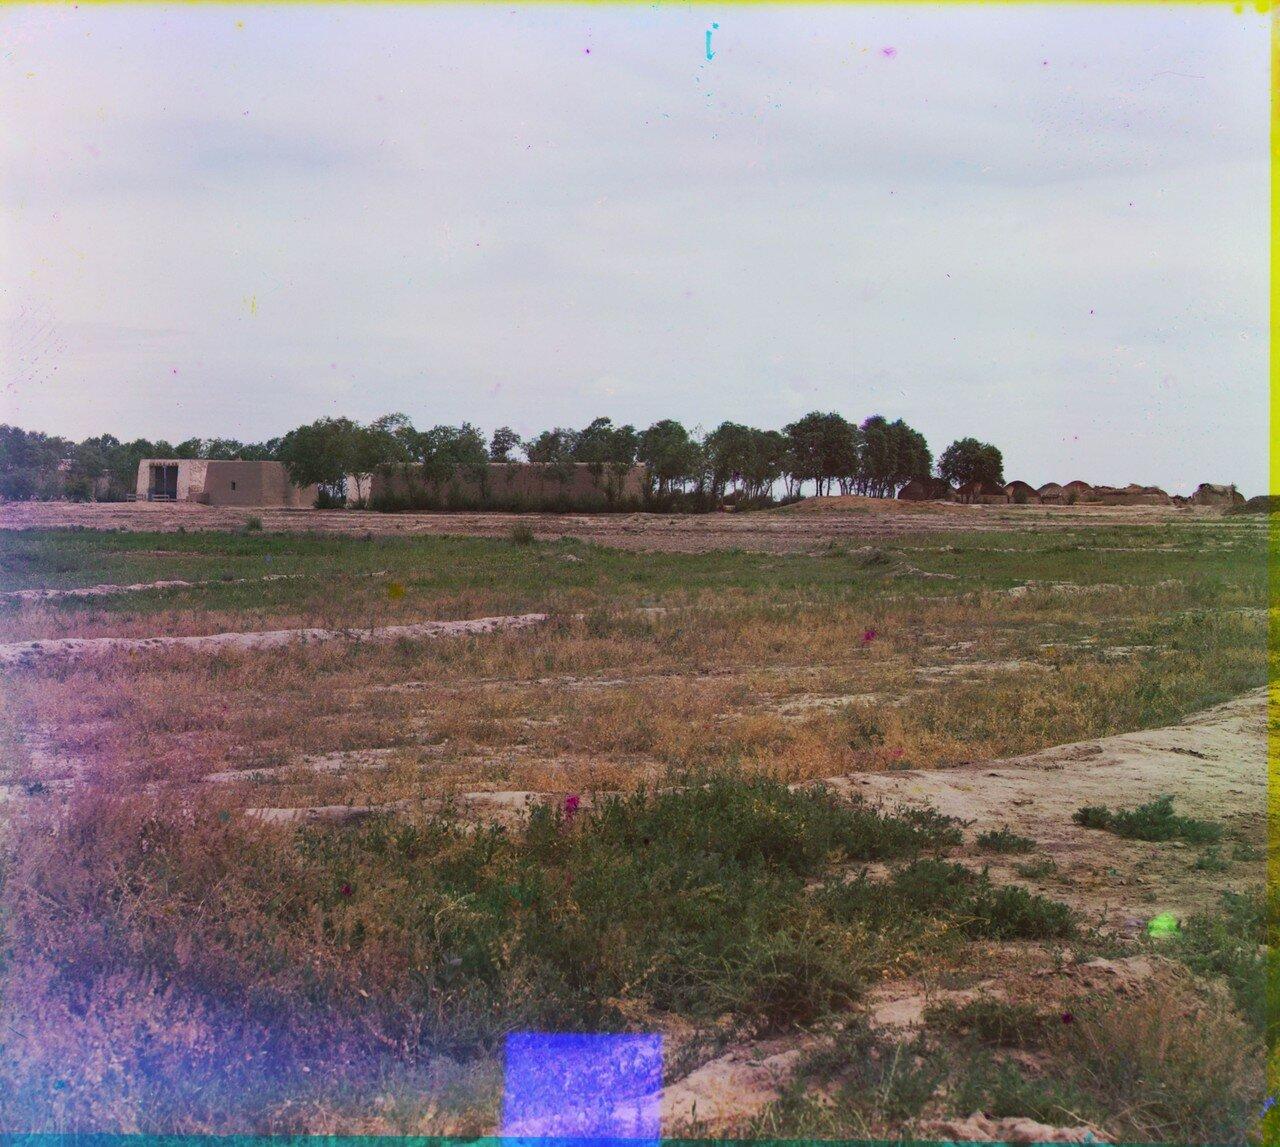 Окрестности Мерва. Близ Байрам-Али. Общий вид текинского поселка